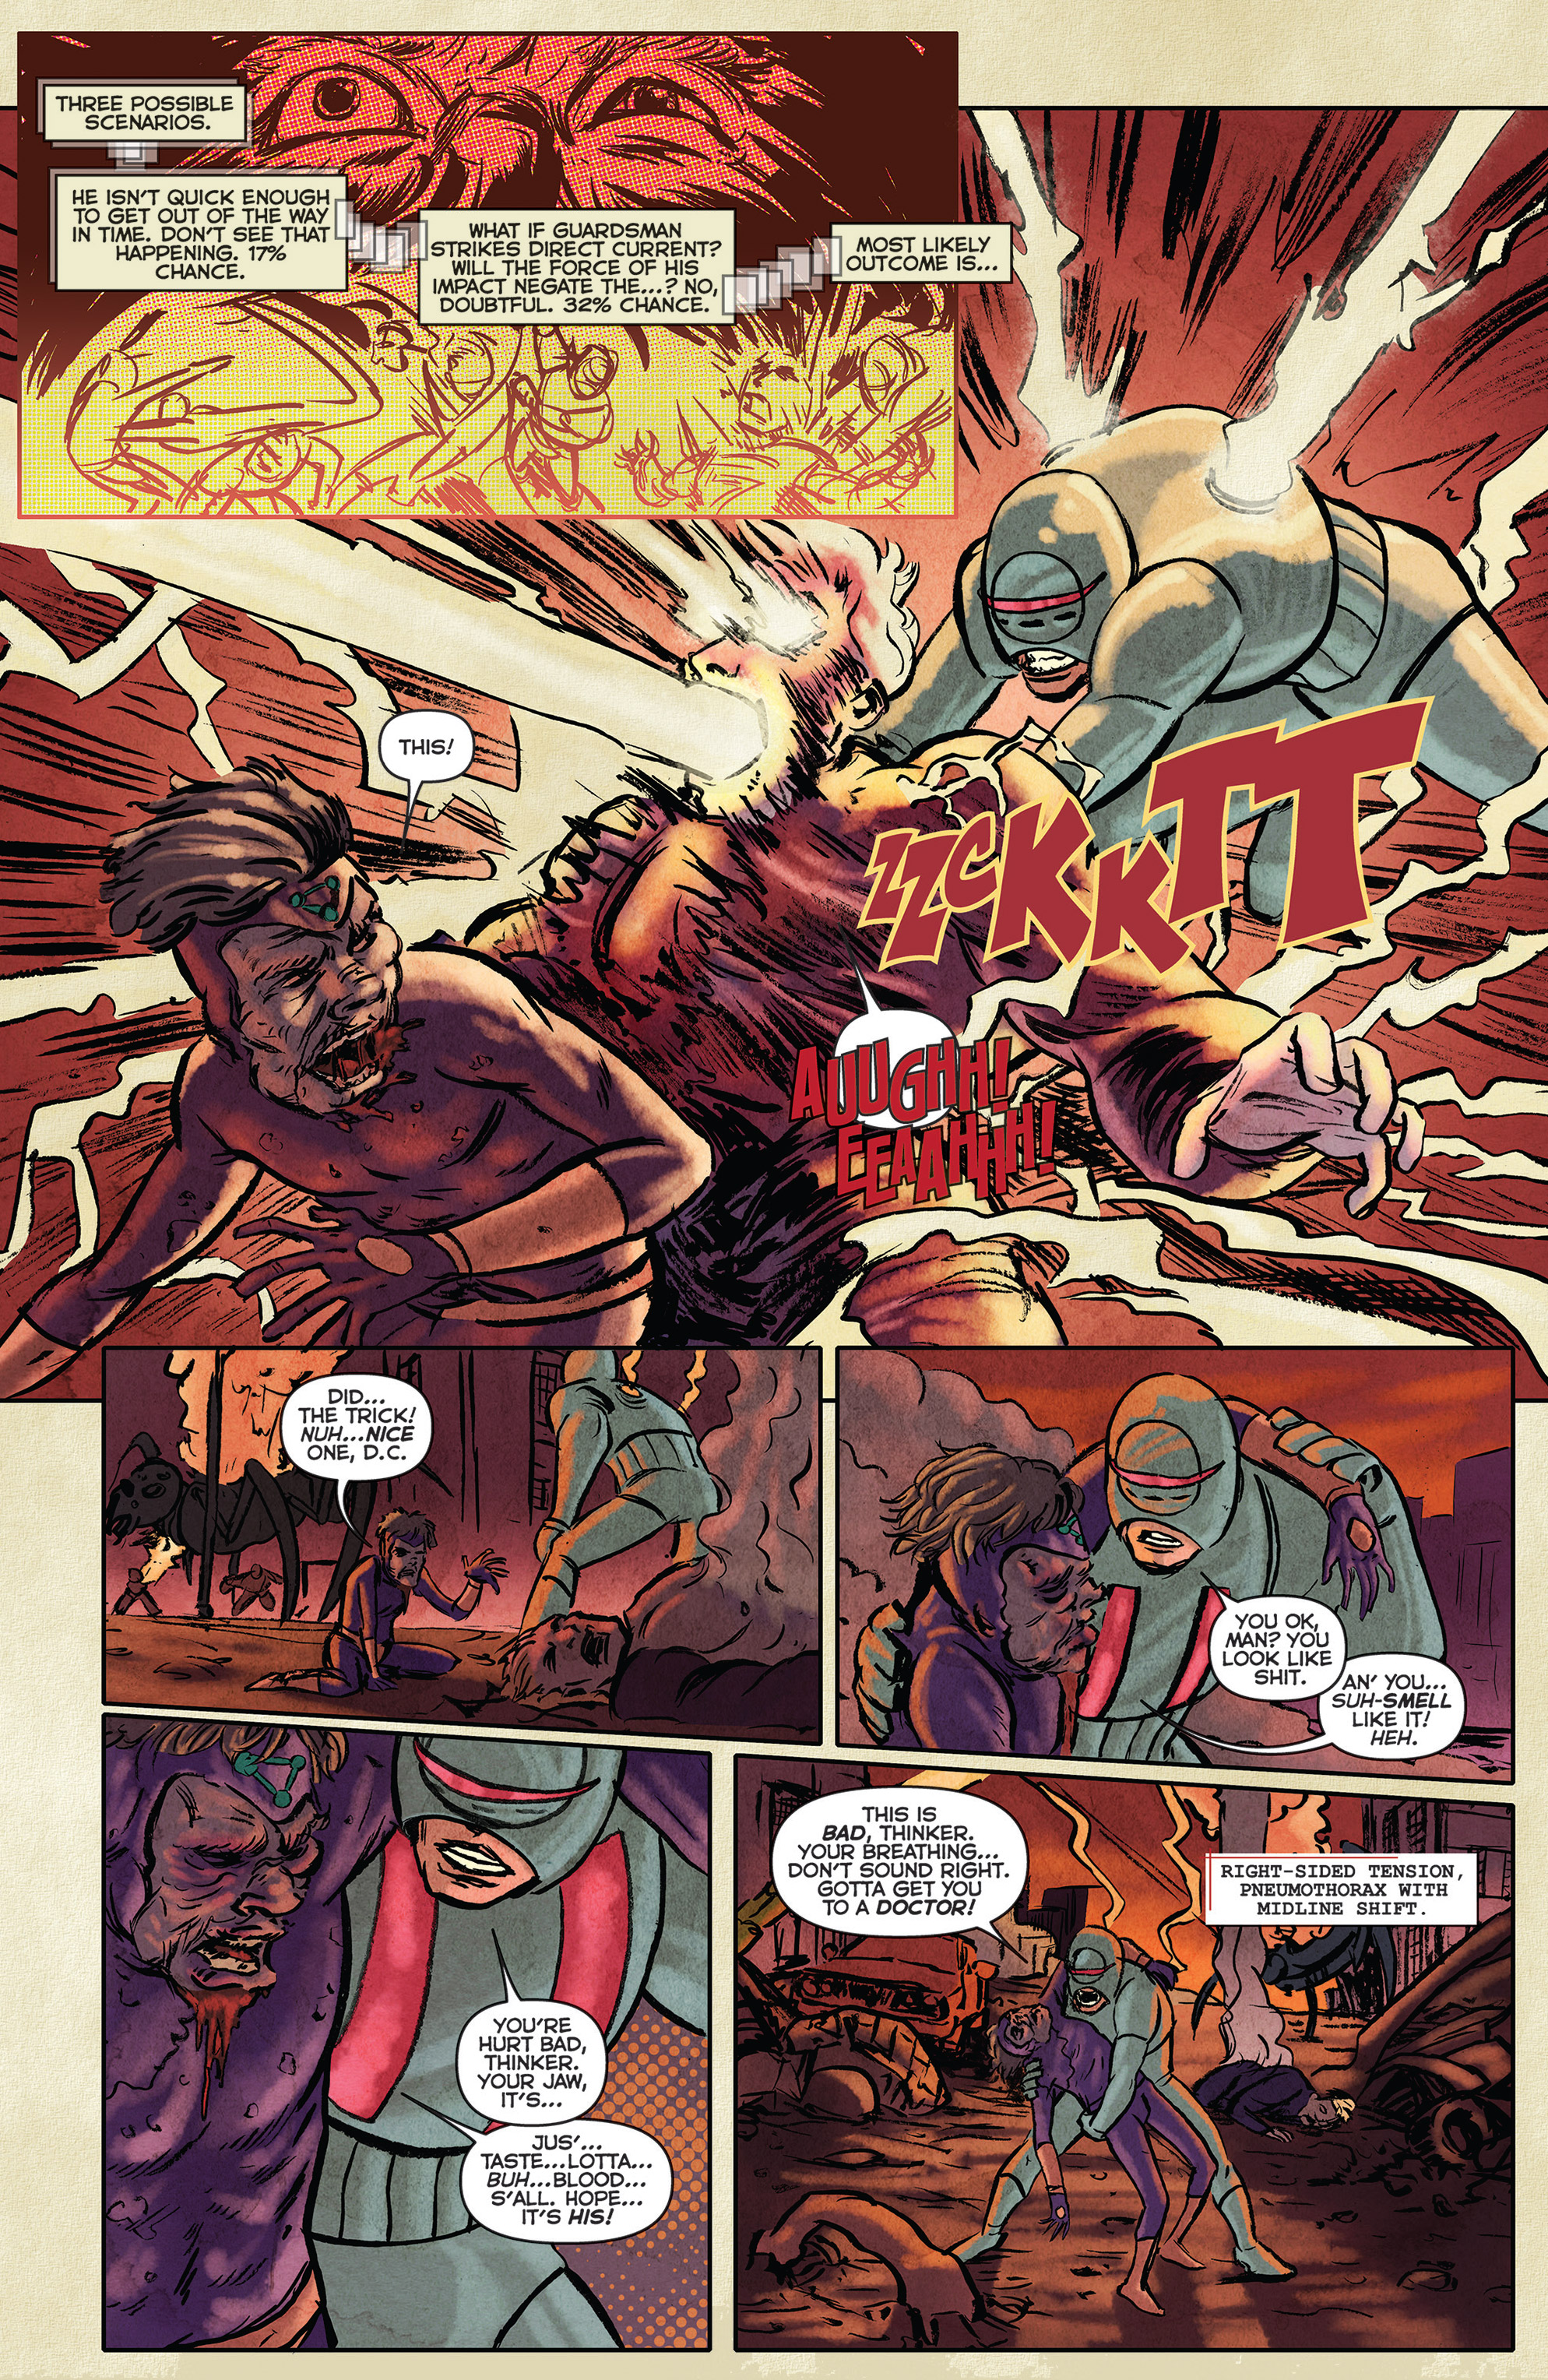 Read online Medisin comic -  Issue #1 - 5